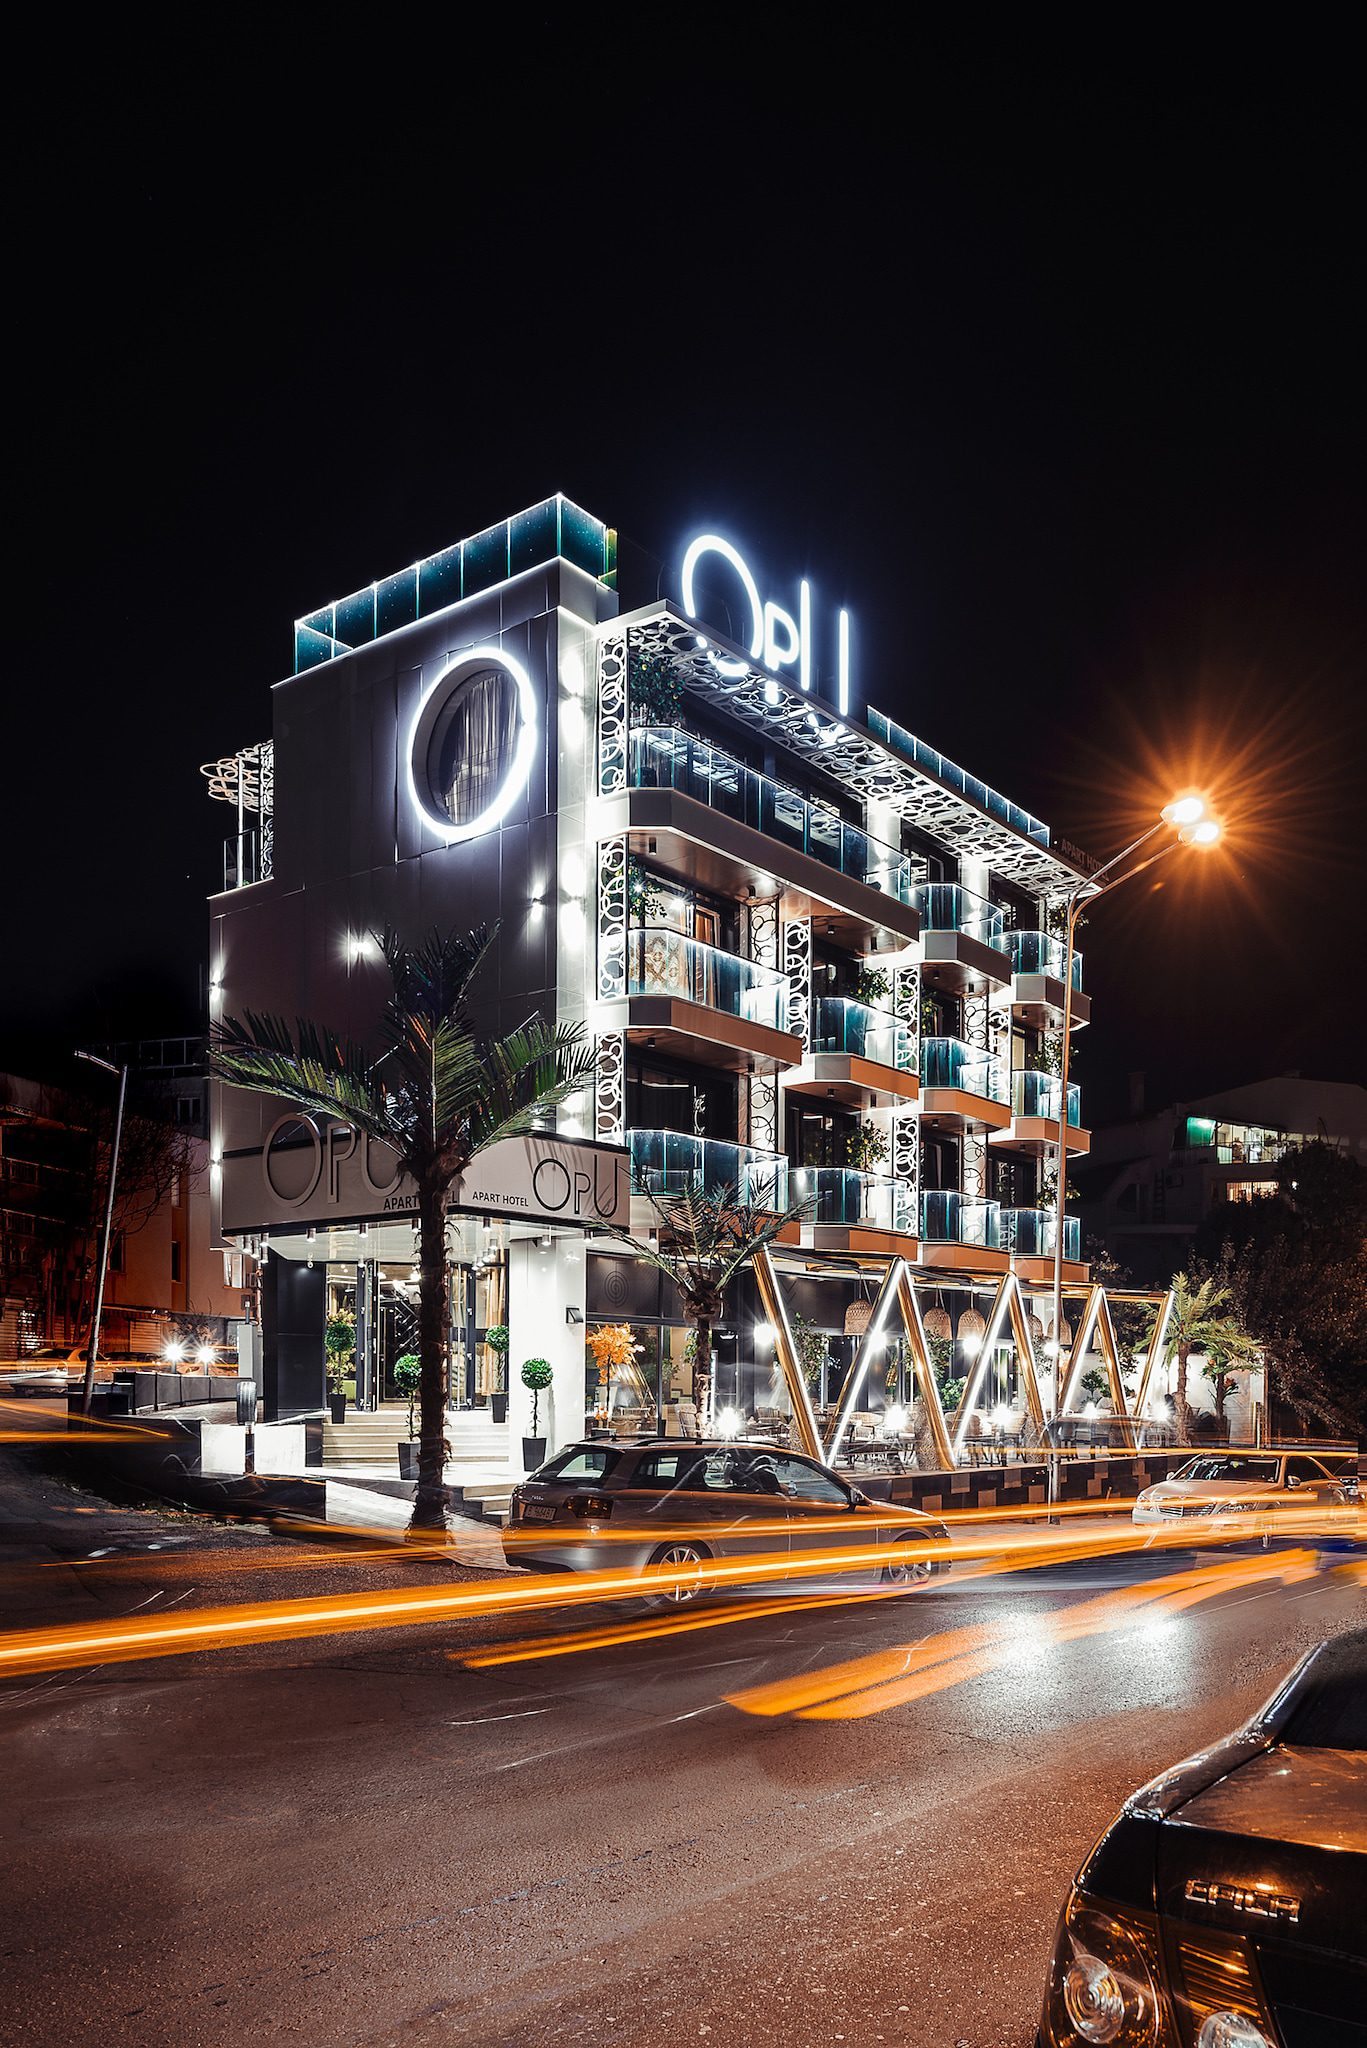 ОПУ, Варна